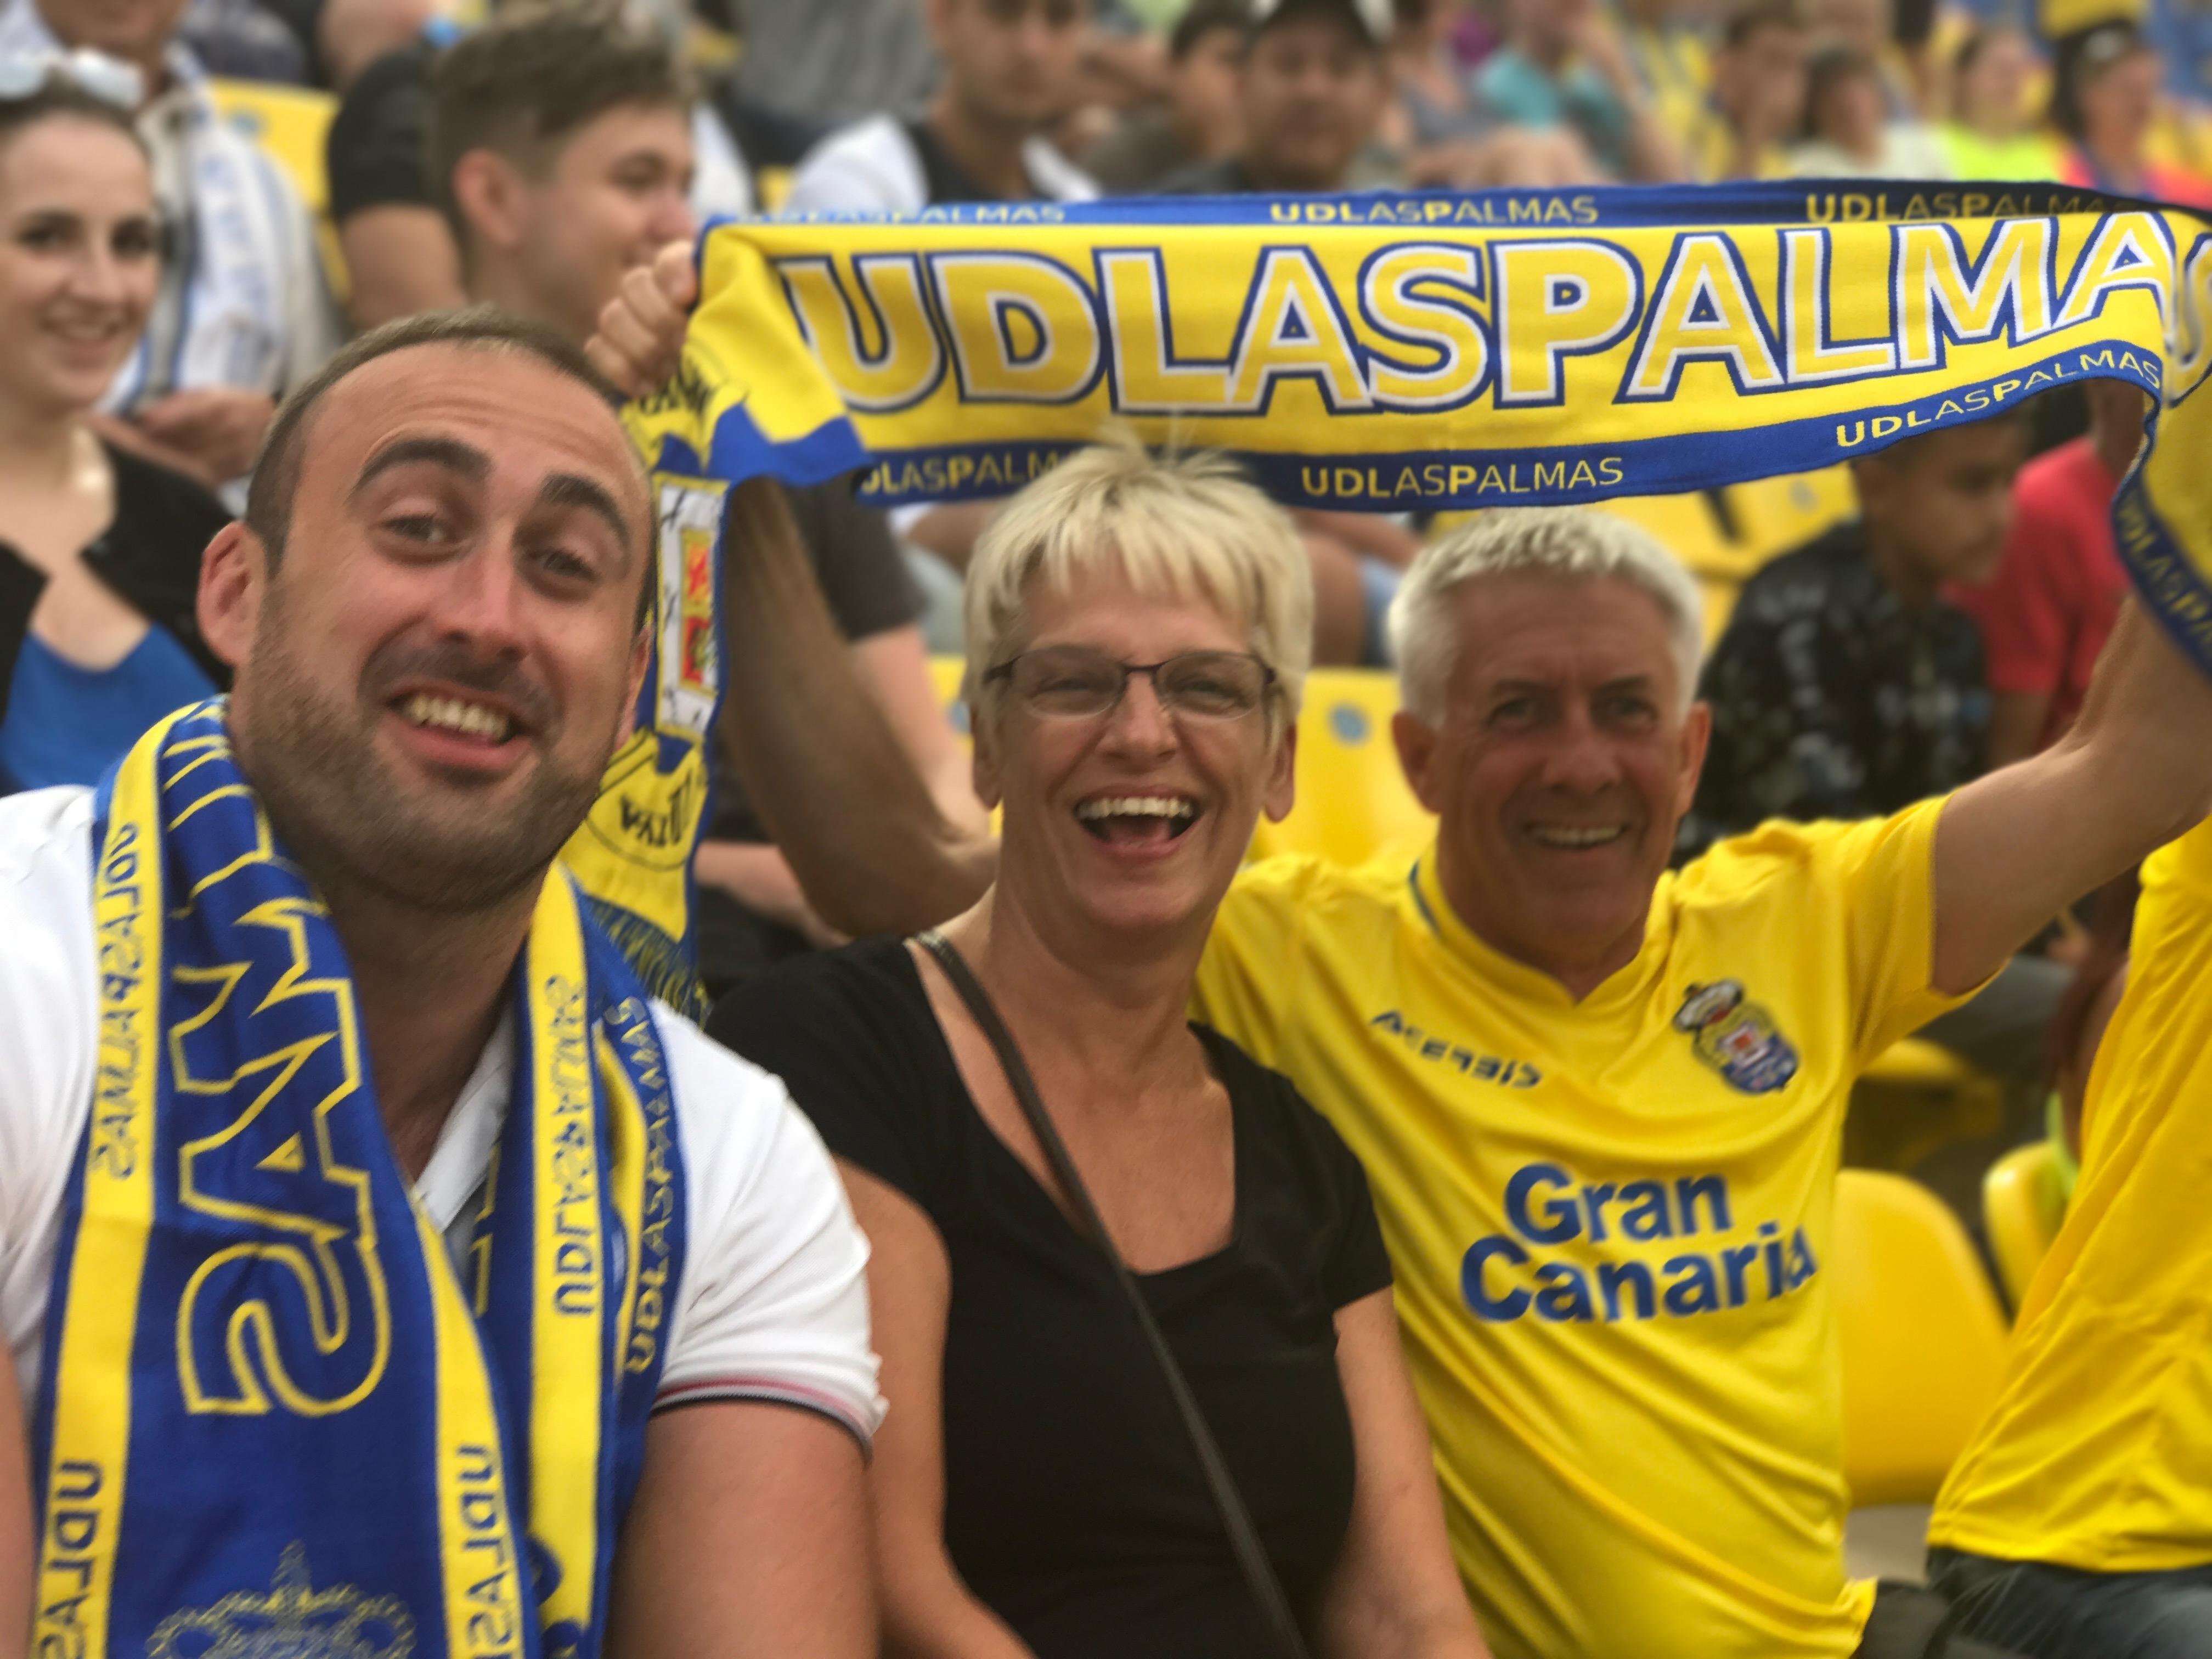 Gran Canaria Football Experience